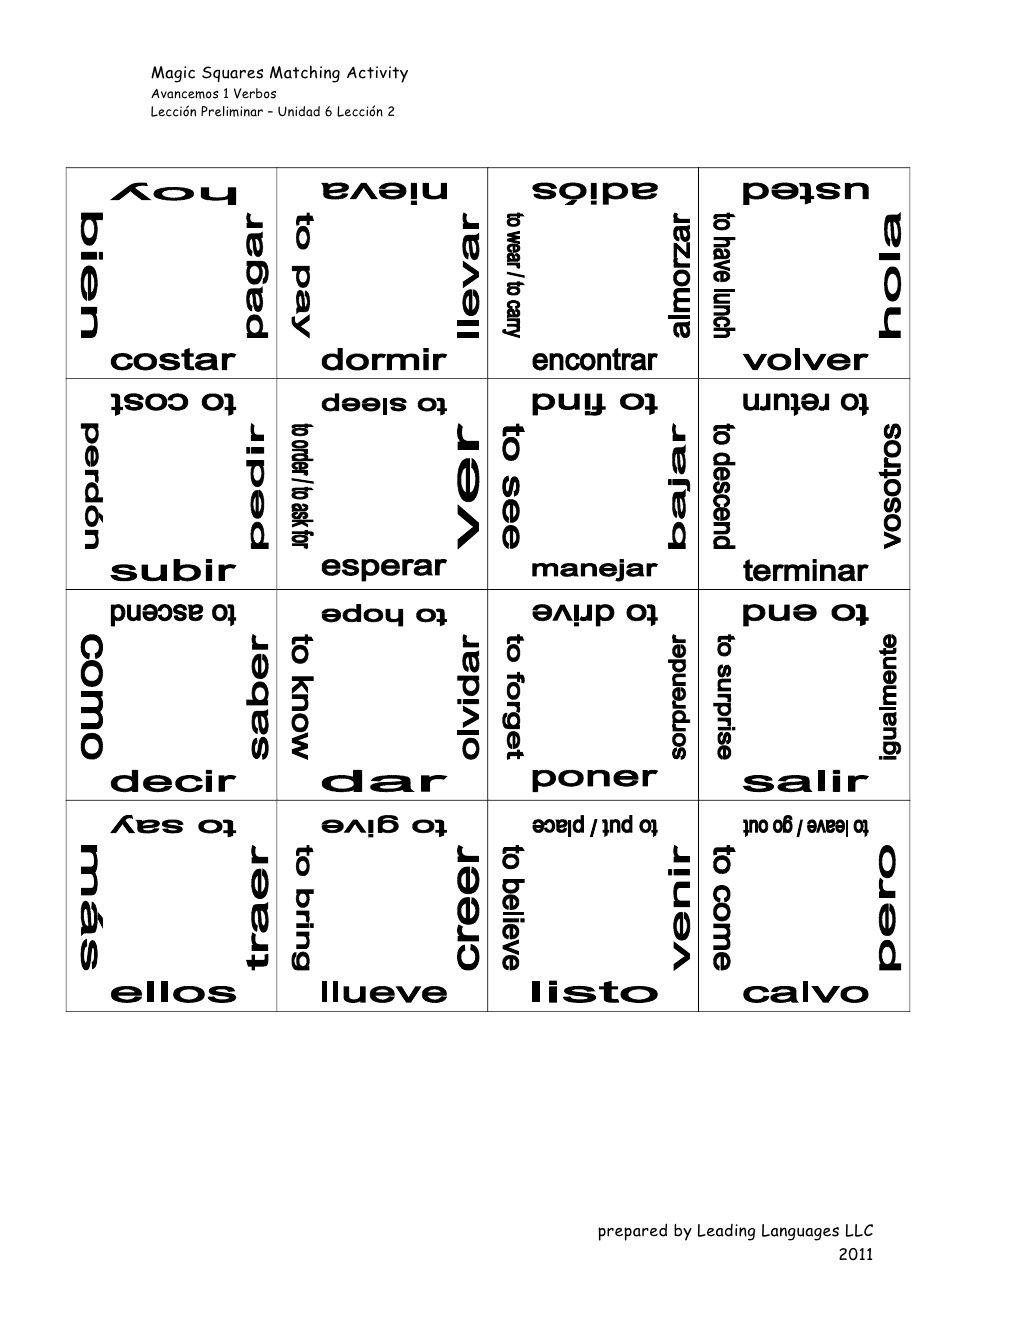 Avancemos 1 All Verbs Magic Squares